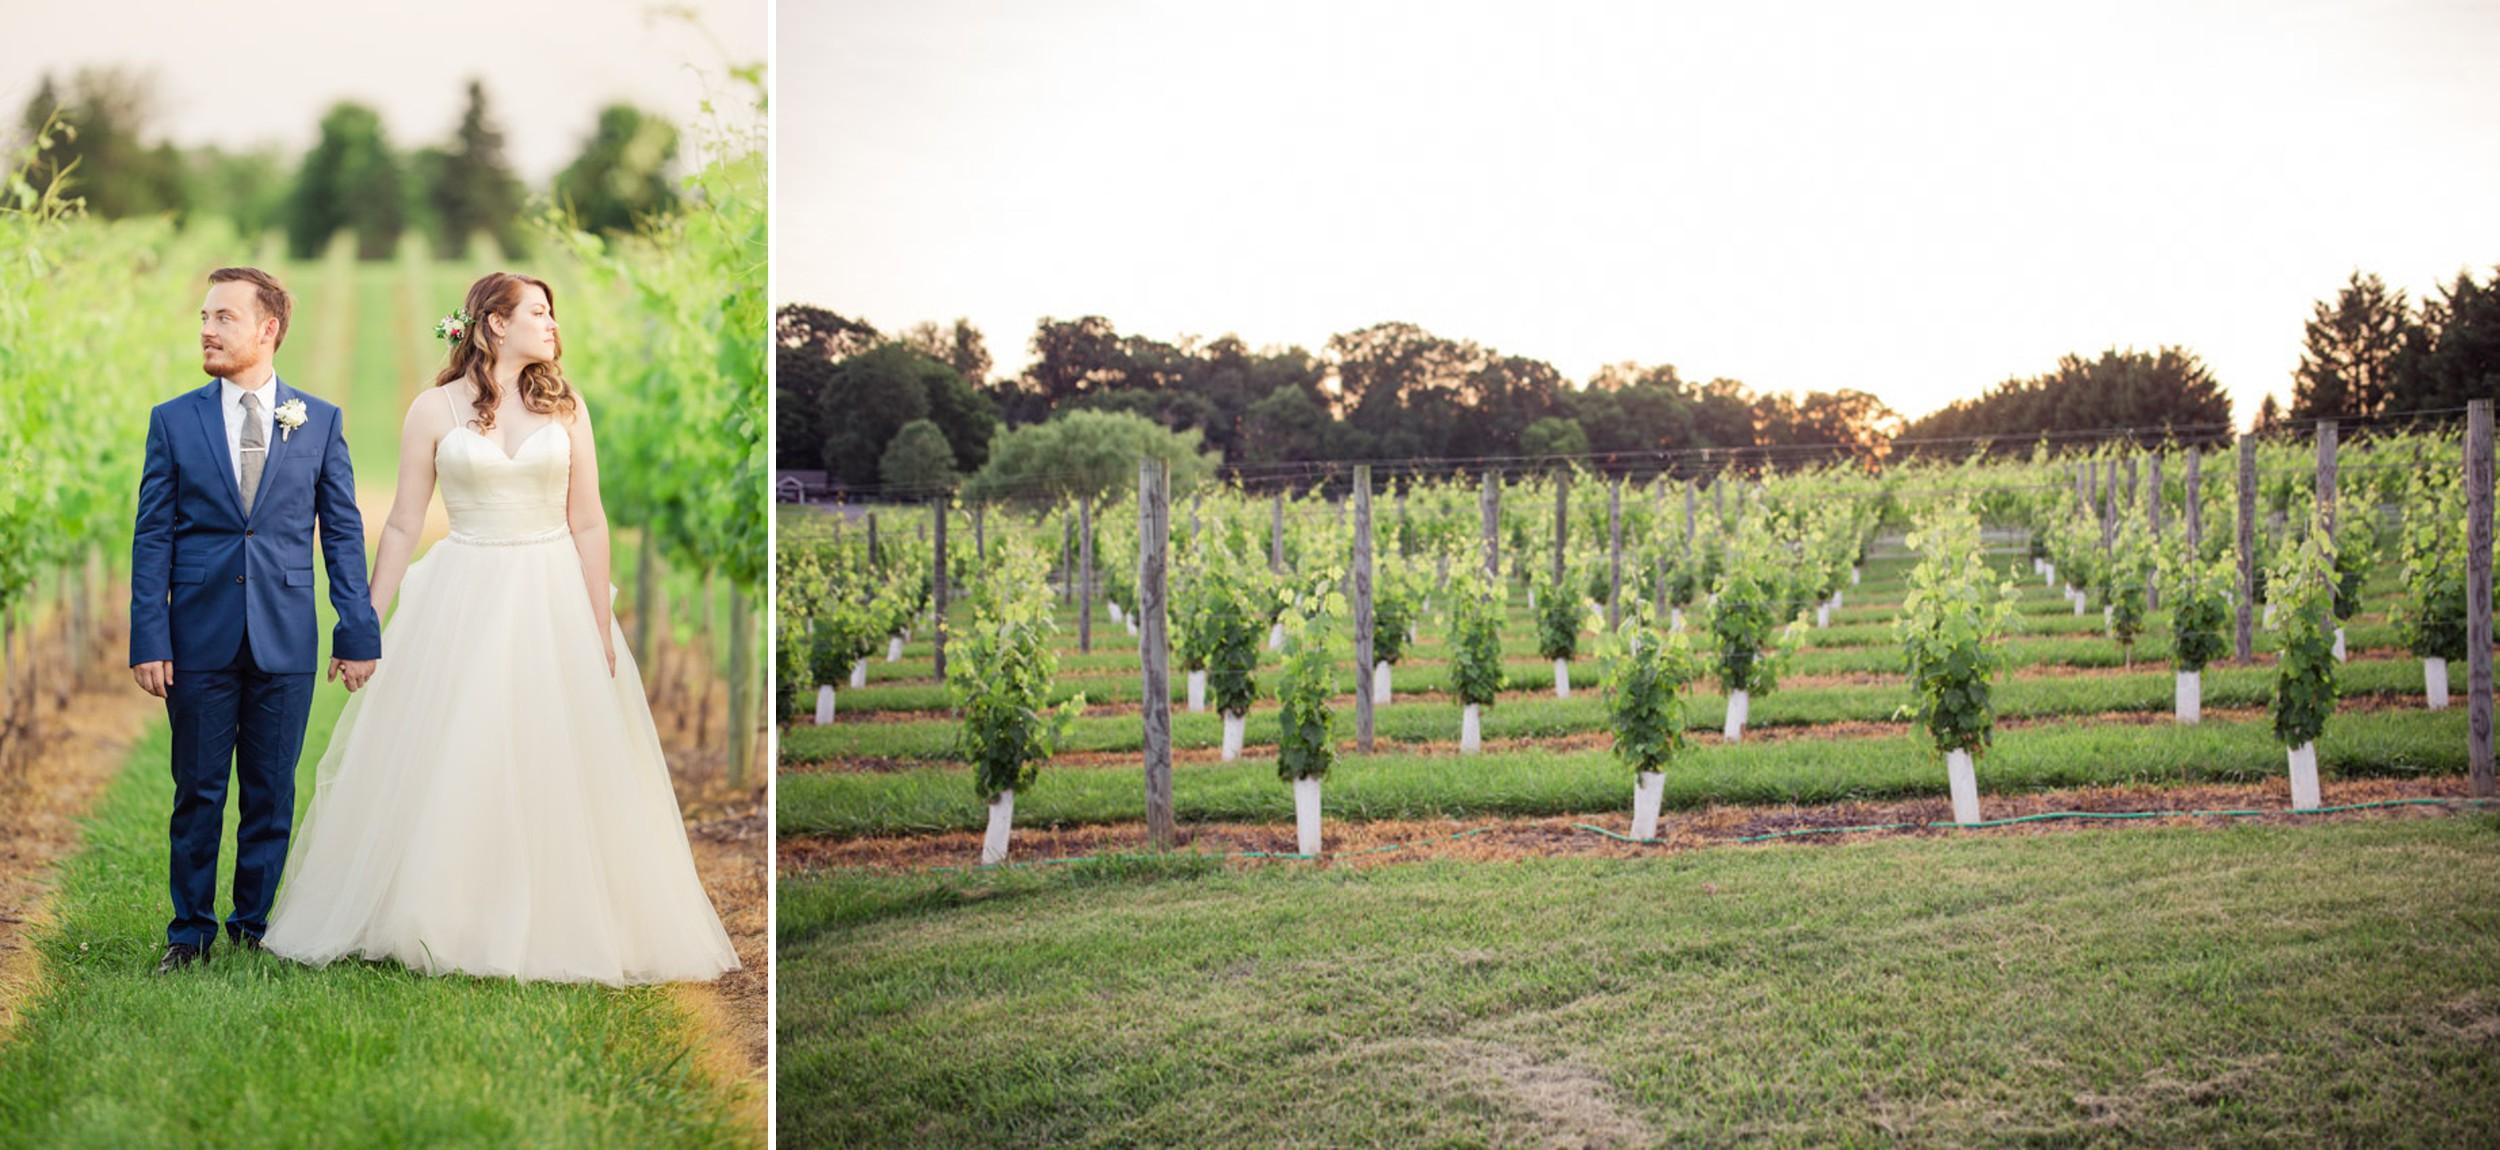 8 Chains North Winery Vineyard